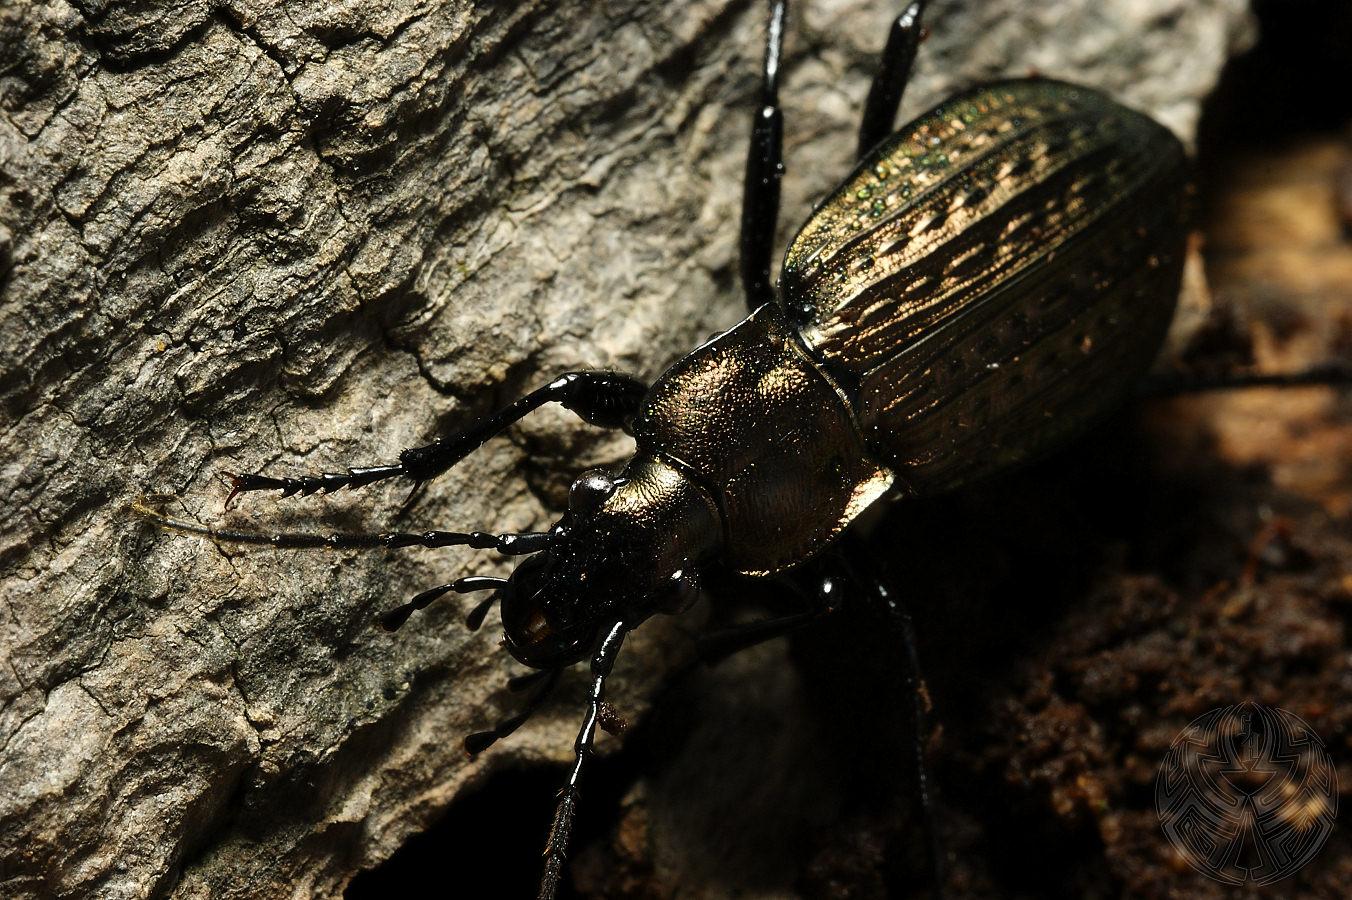 Carabus granulatus by webcruiser